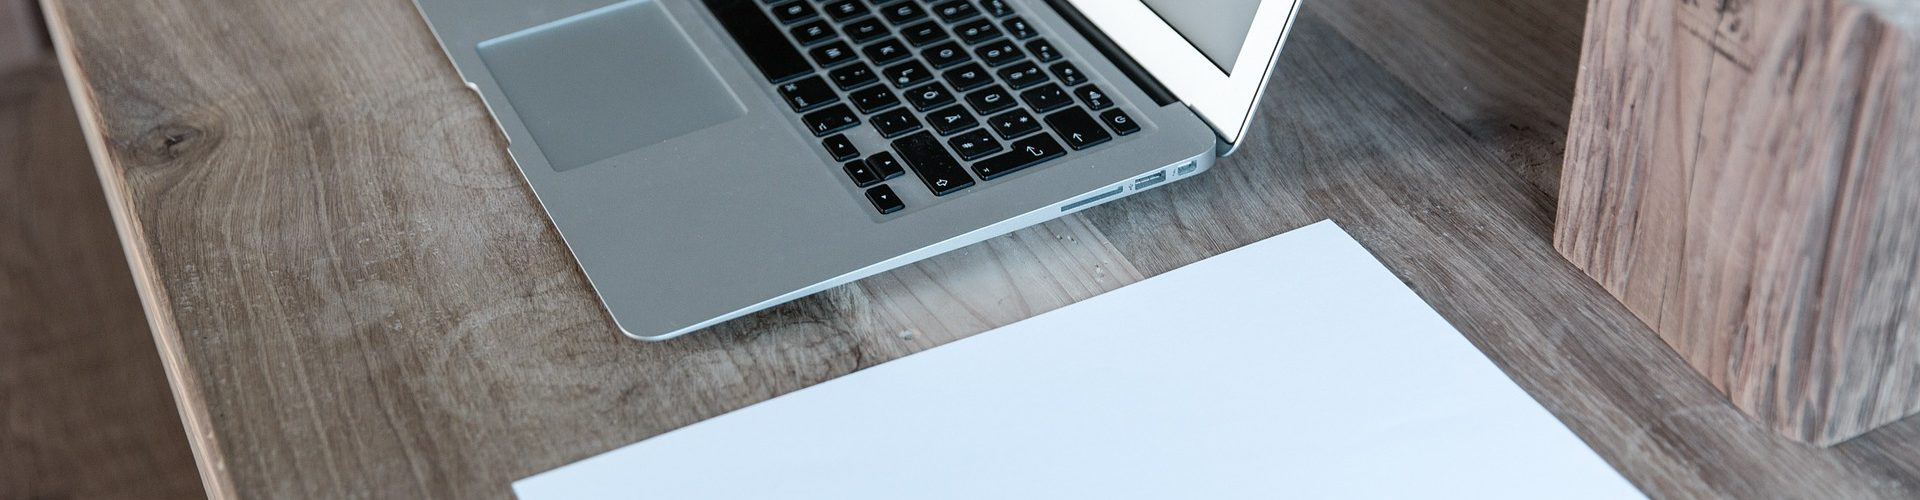 Poleasingowe laptopy klasy biznes